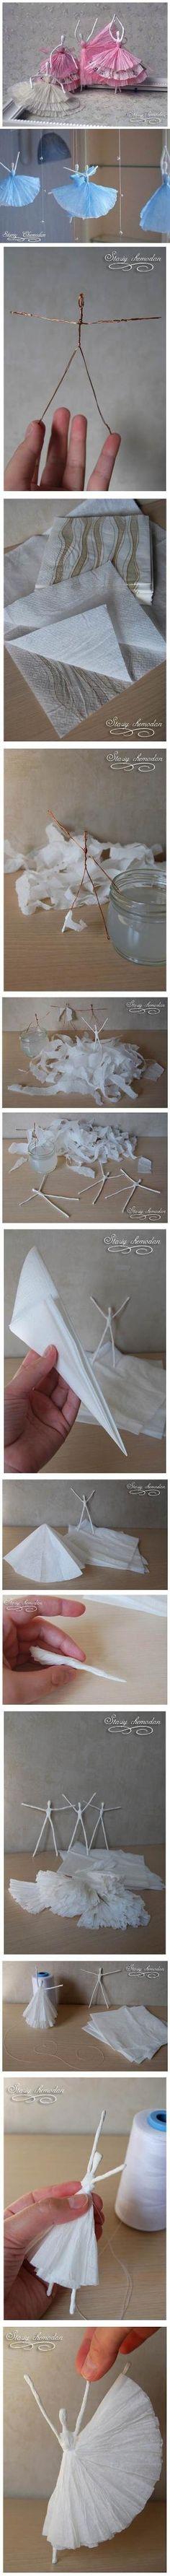 DIY Napkin Paper Ballerina by de_rose